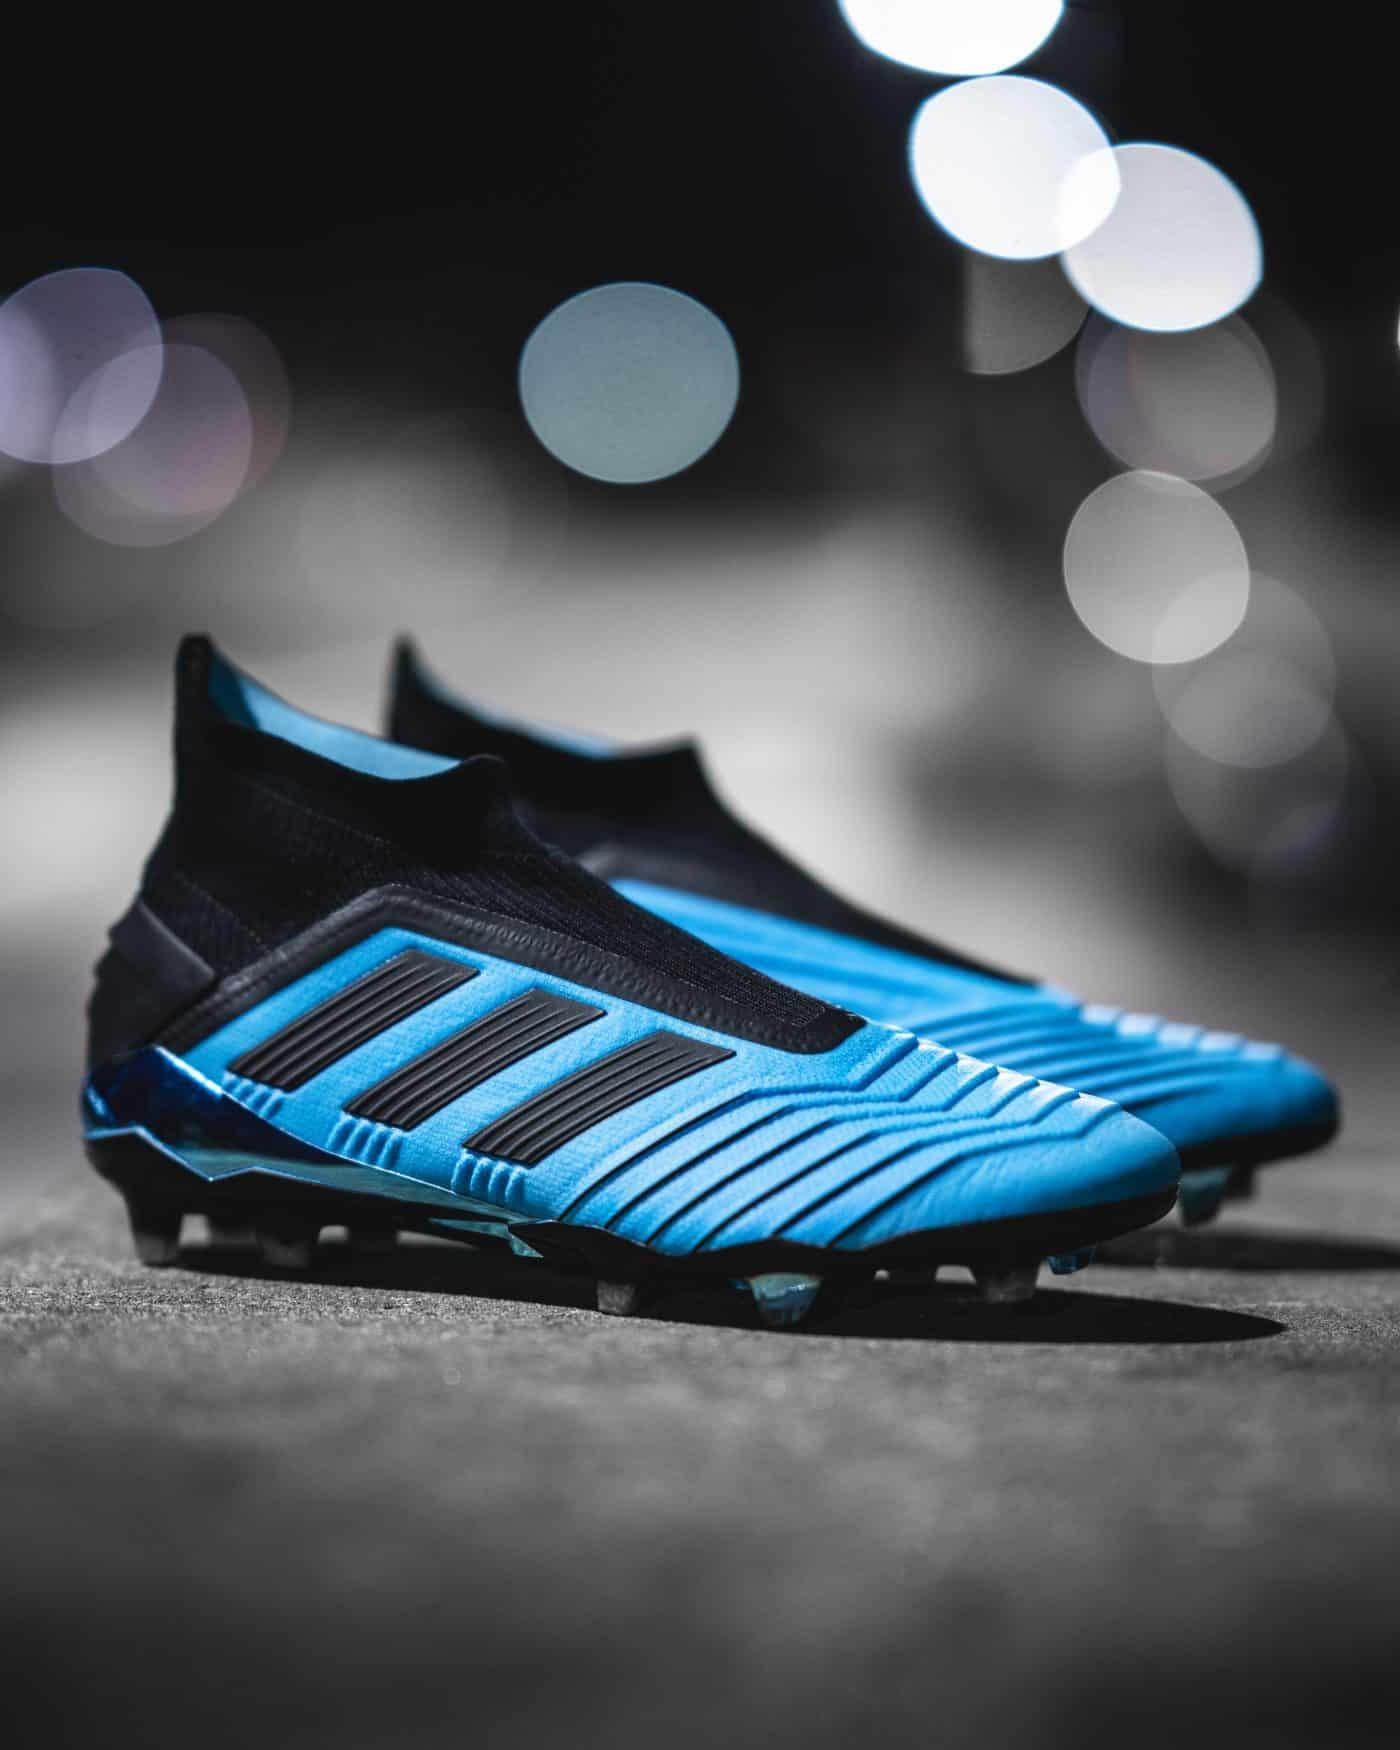 adidas-predator-19-pack-hard-wired-juillet-2019-8